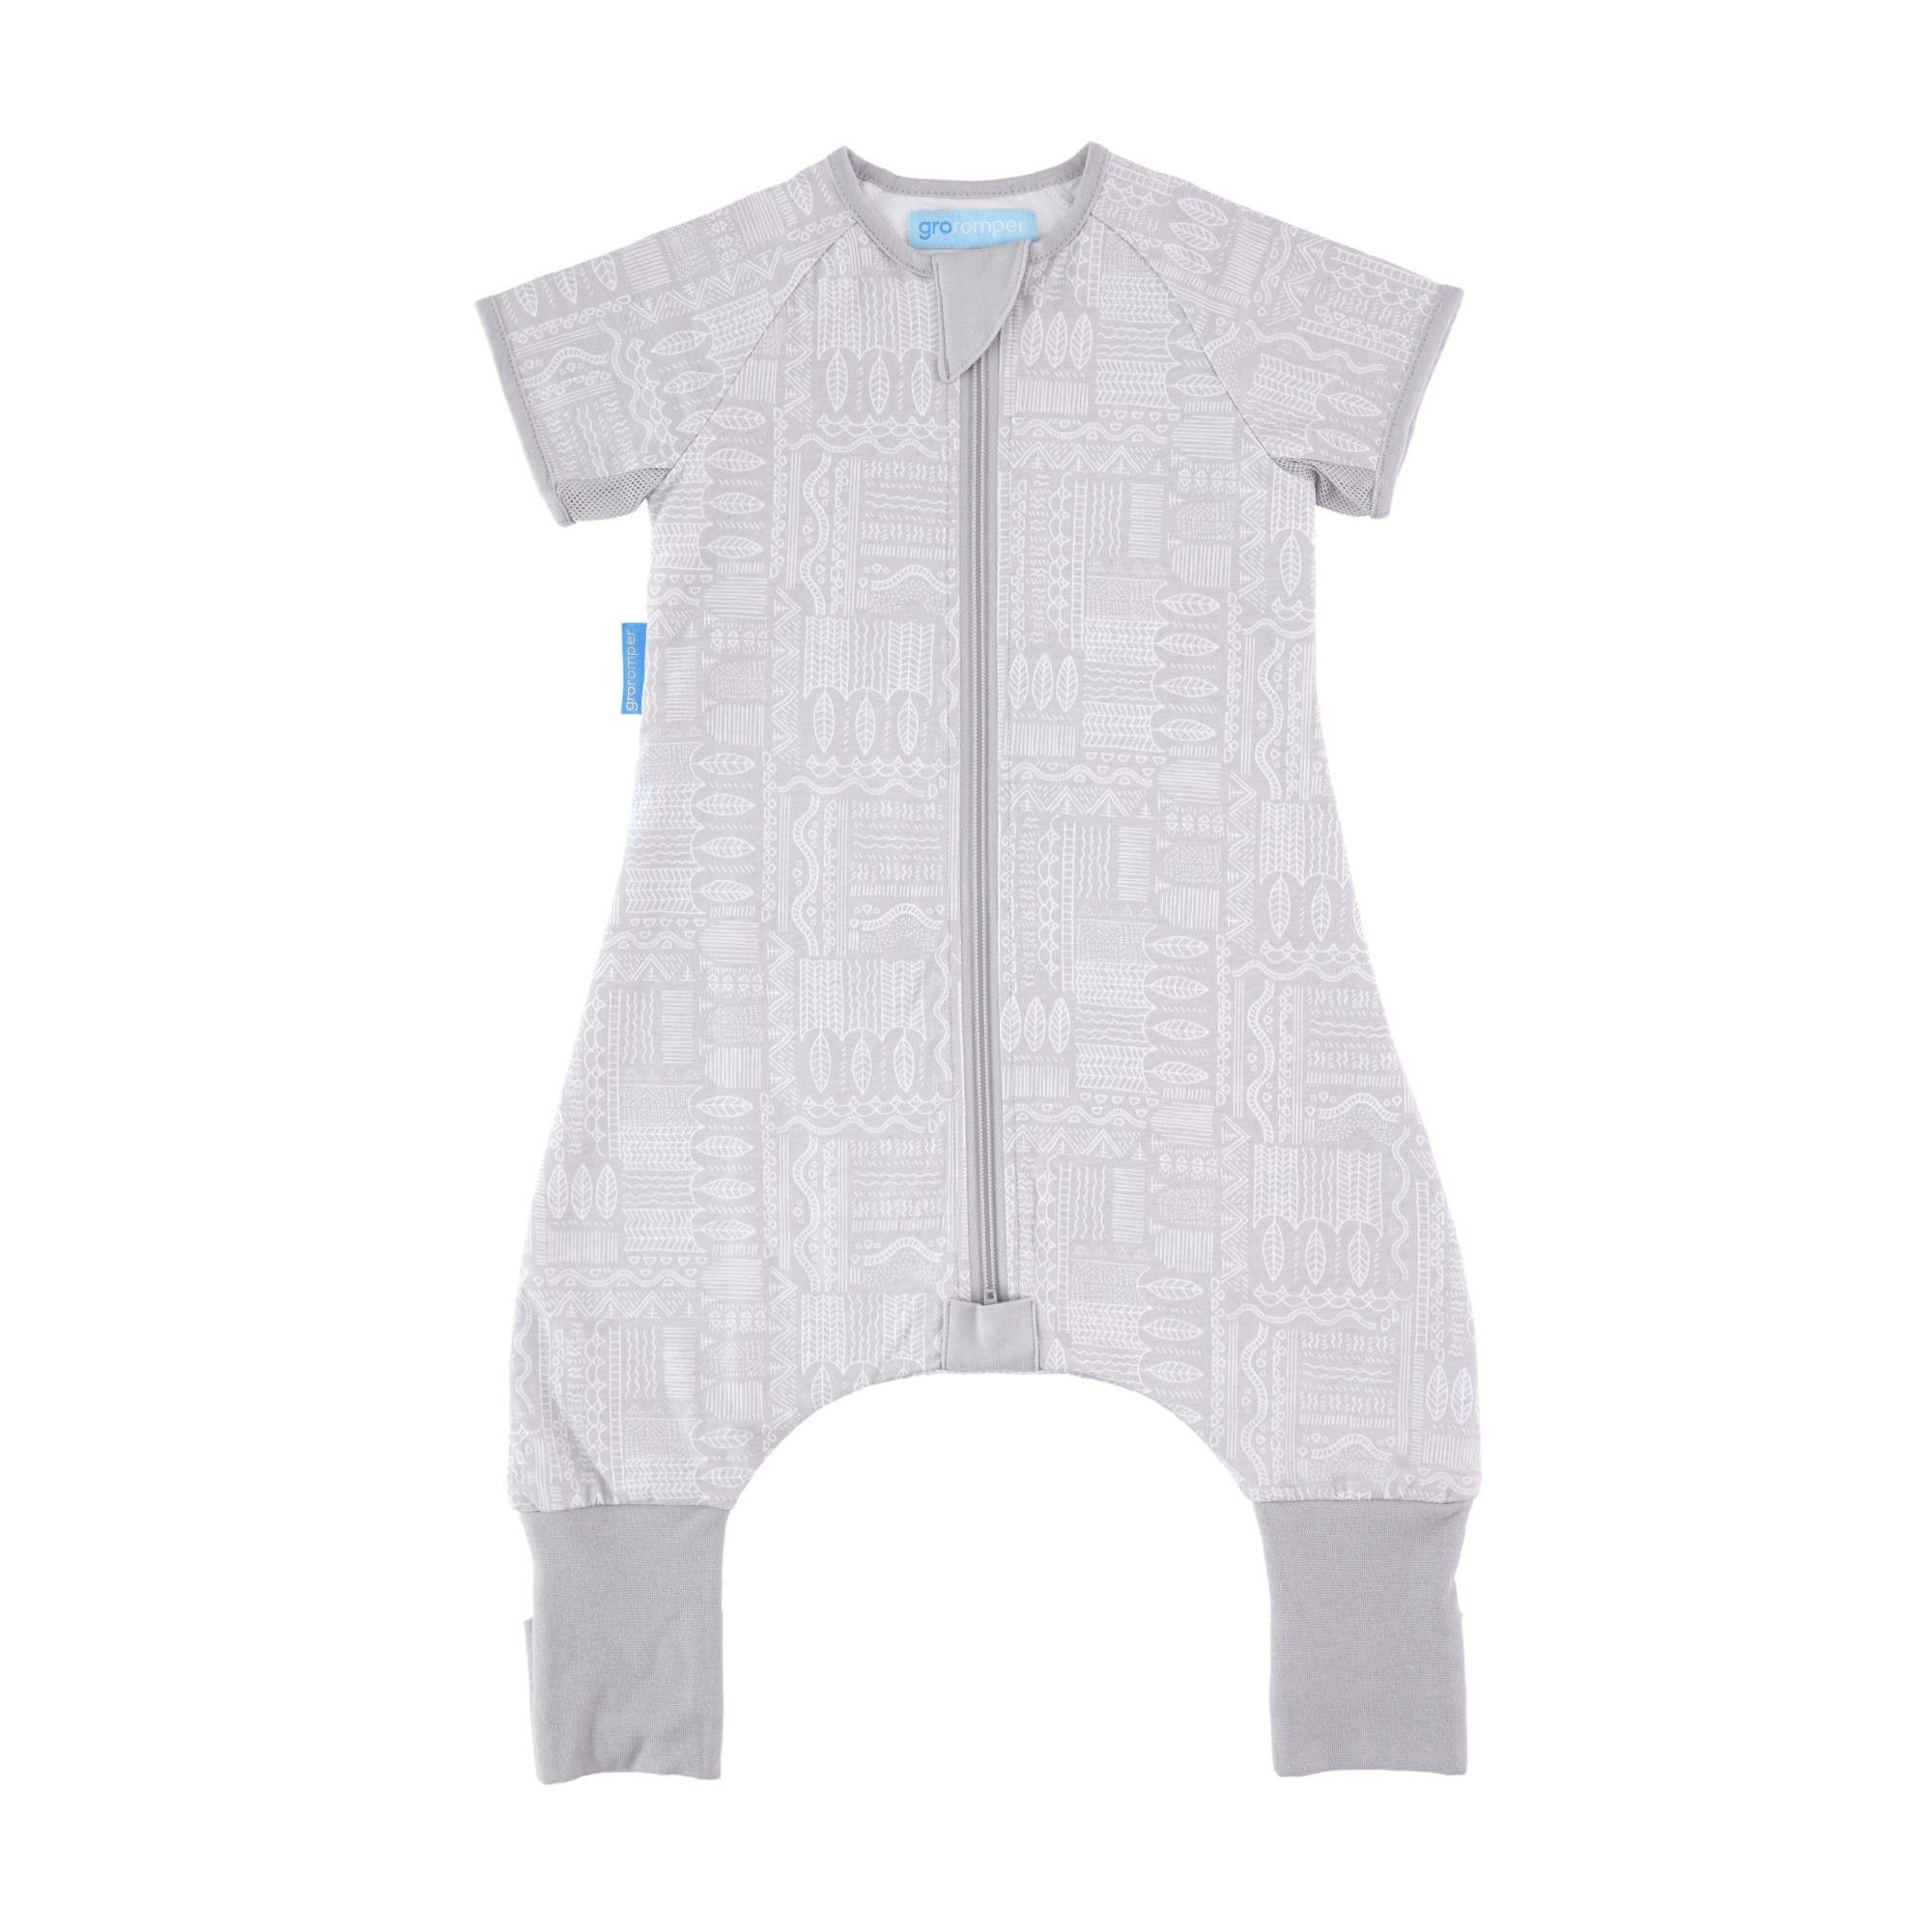 Body pentru Bebelusi, Subtire, Gri deschis, 12 - 24 luni, Gro